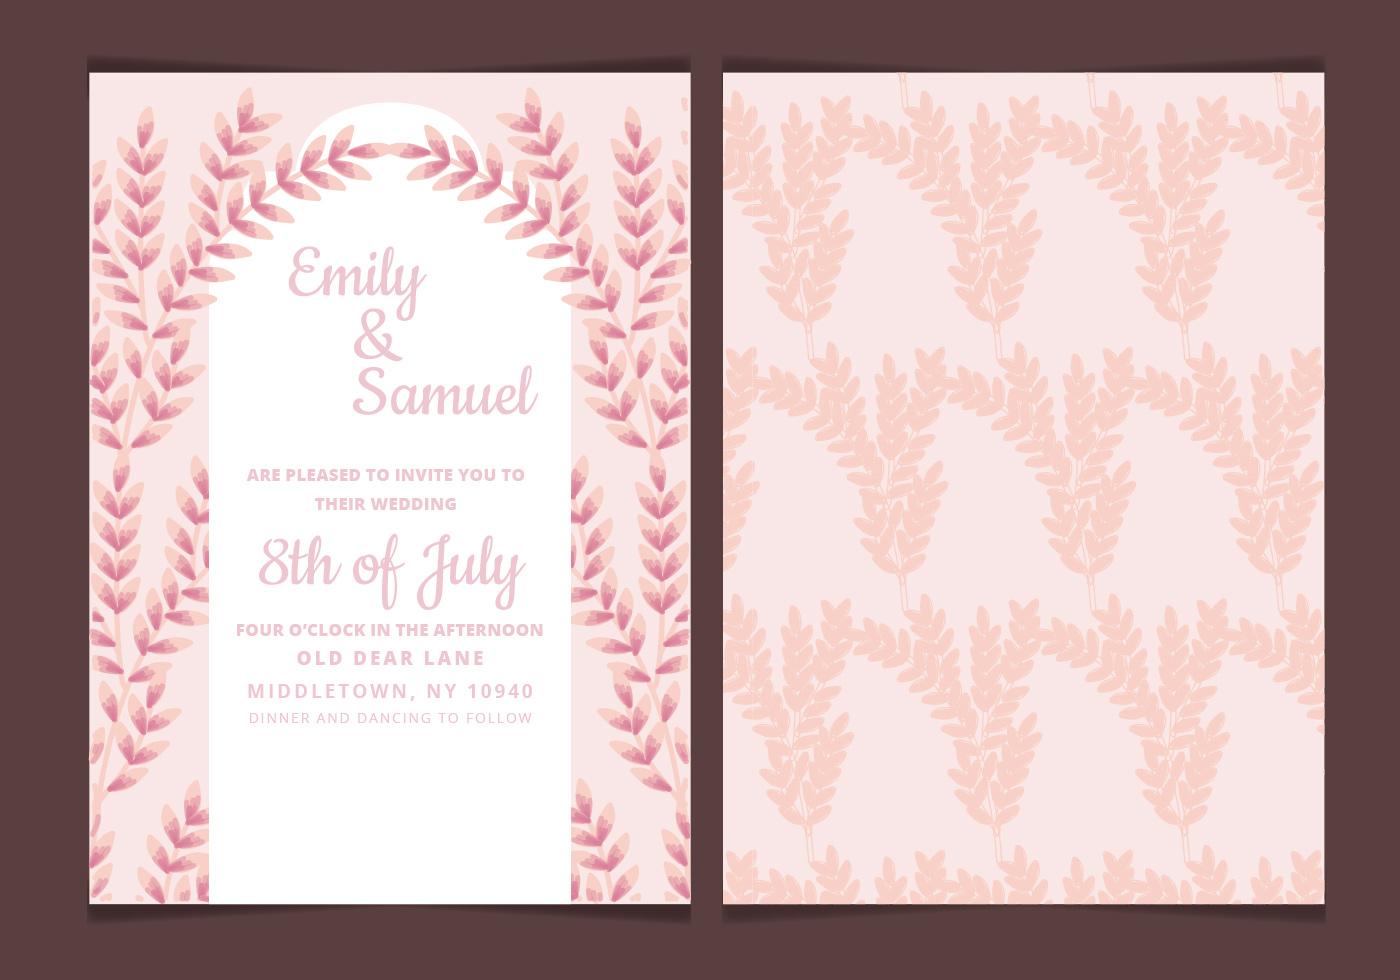 Vector Wedding Invitations: Vector Wedding Invitation With Feminine Branches